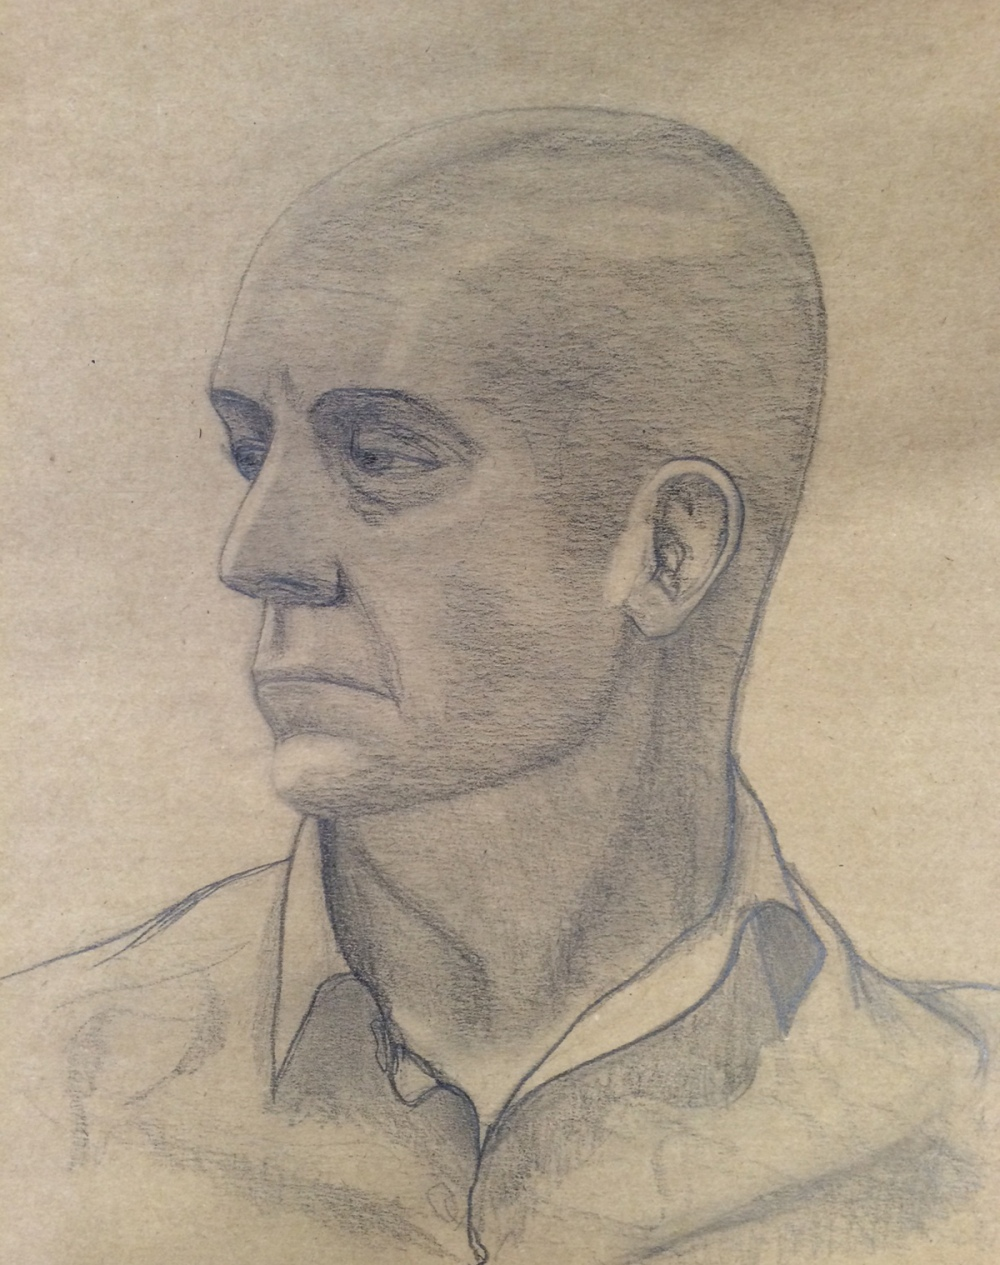 Life drawing - head study